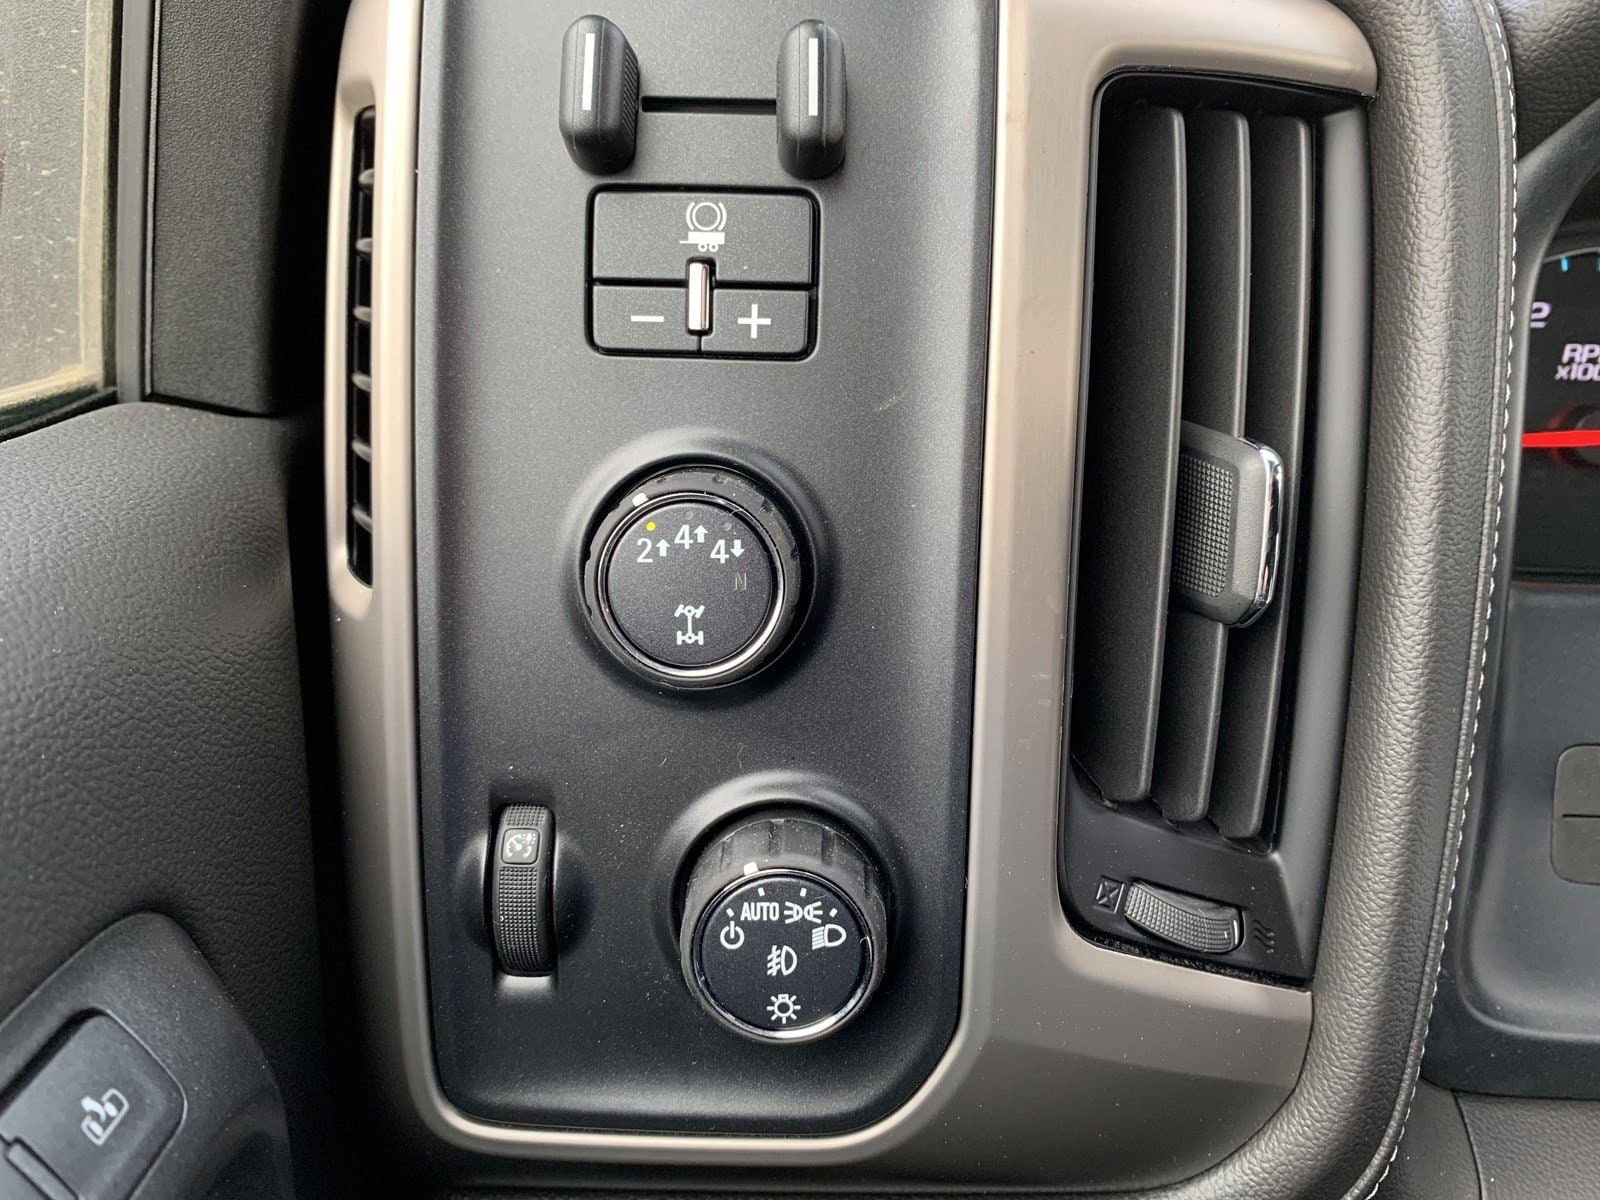 New 2019 GMC Sierra 2500HD For Sale at Johnson Auto Plaza | VIN